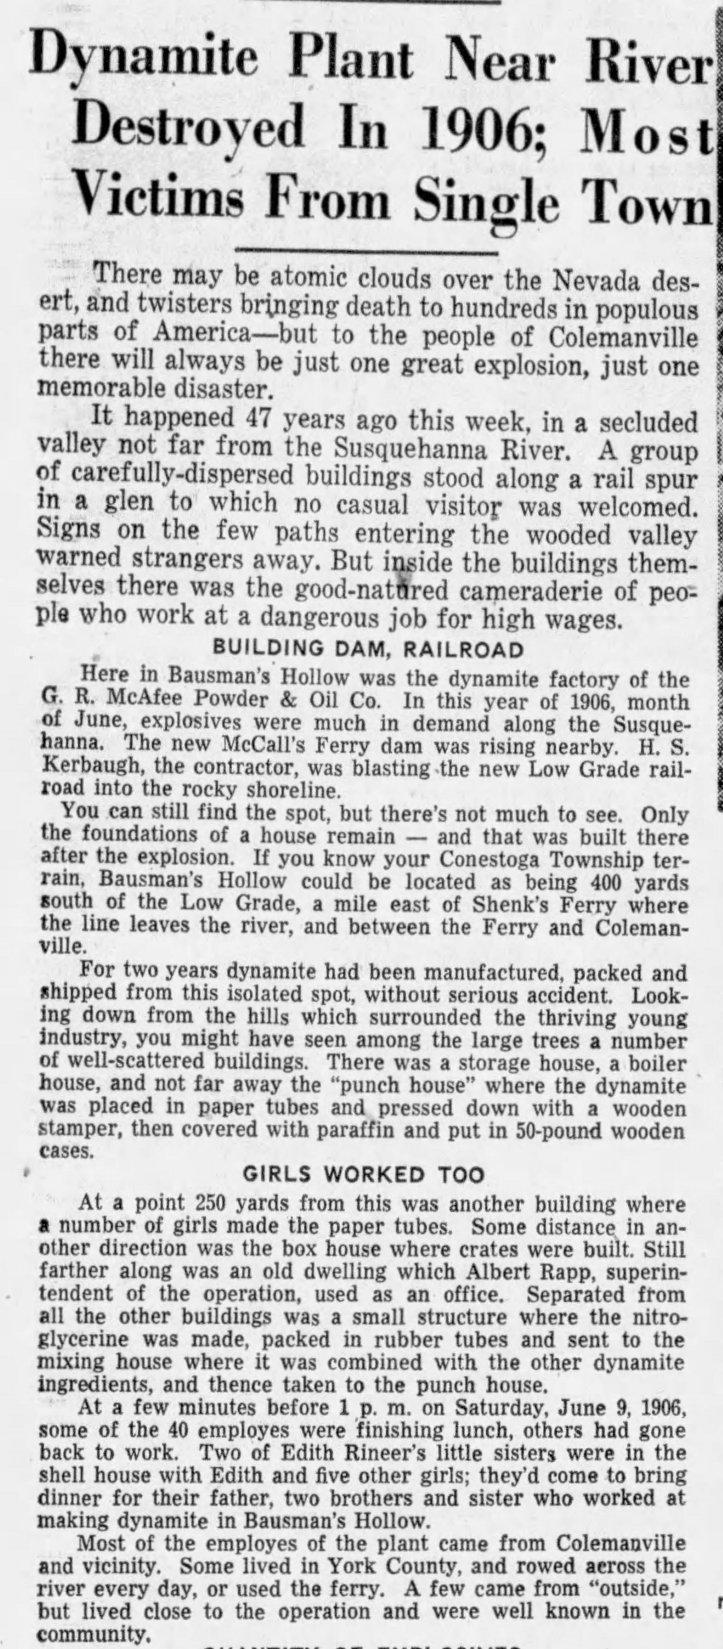 Sunday_News_Sun__Jun_14__1953_